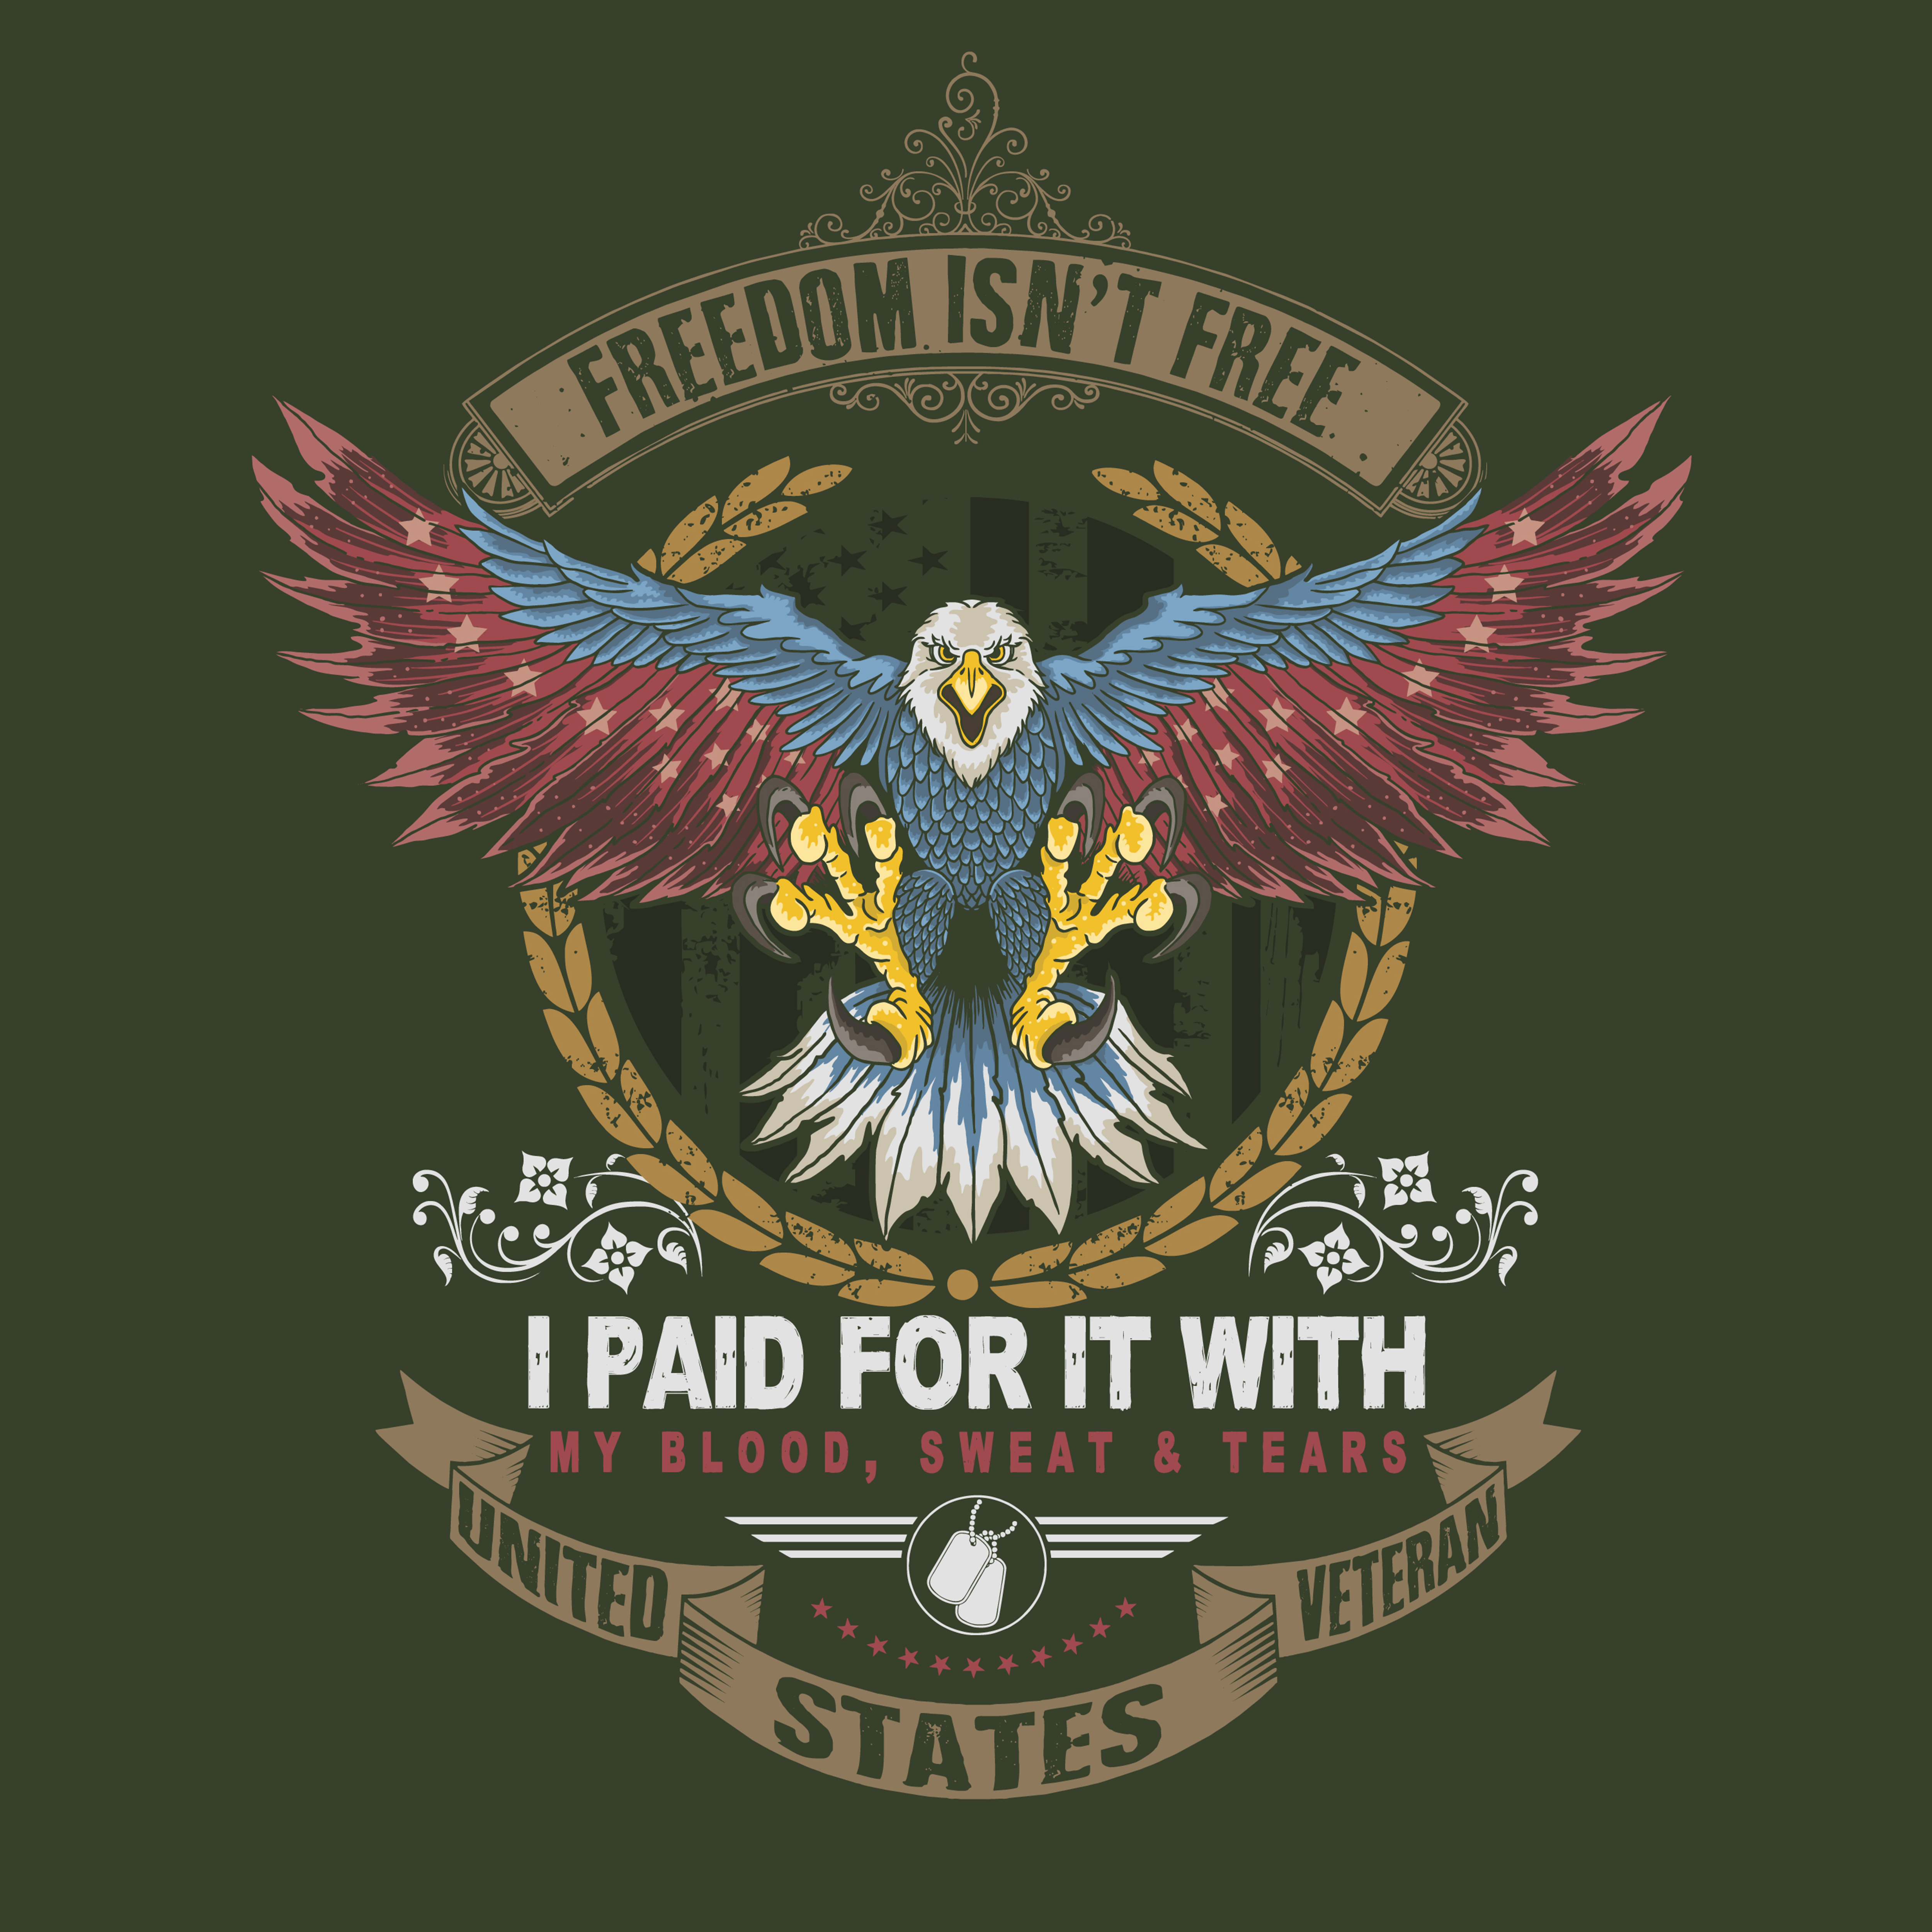 Freedom isn't free America eagle veteran design - Download ...